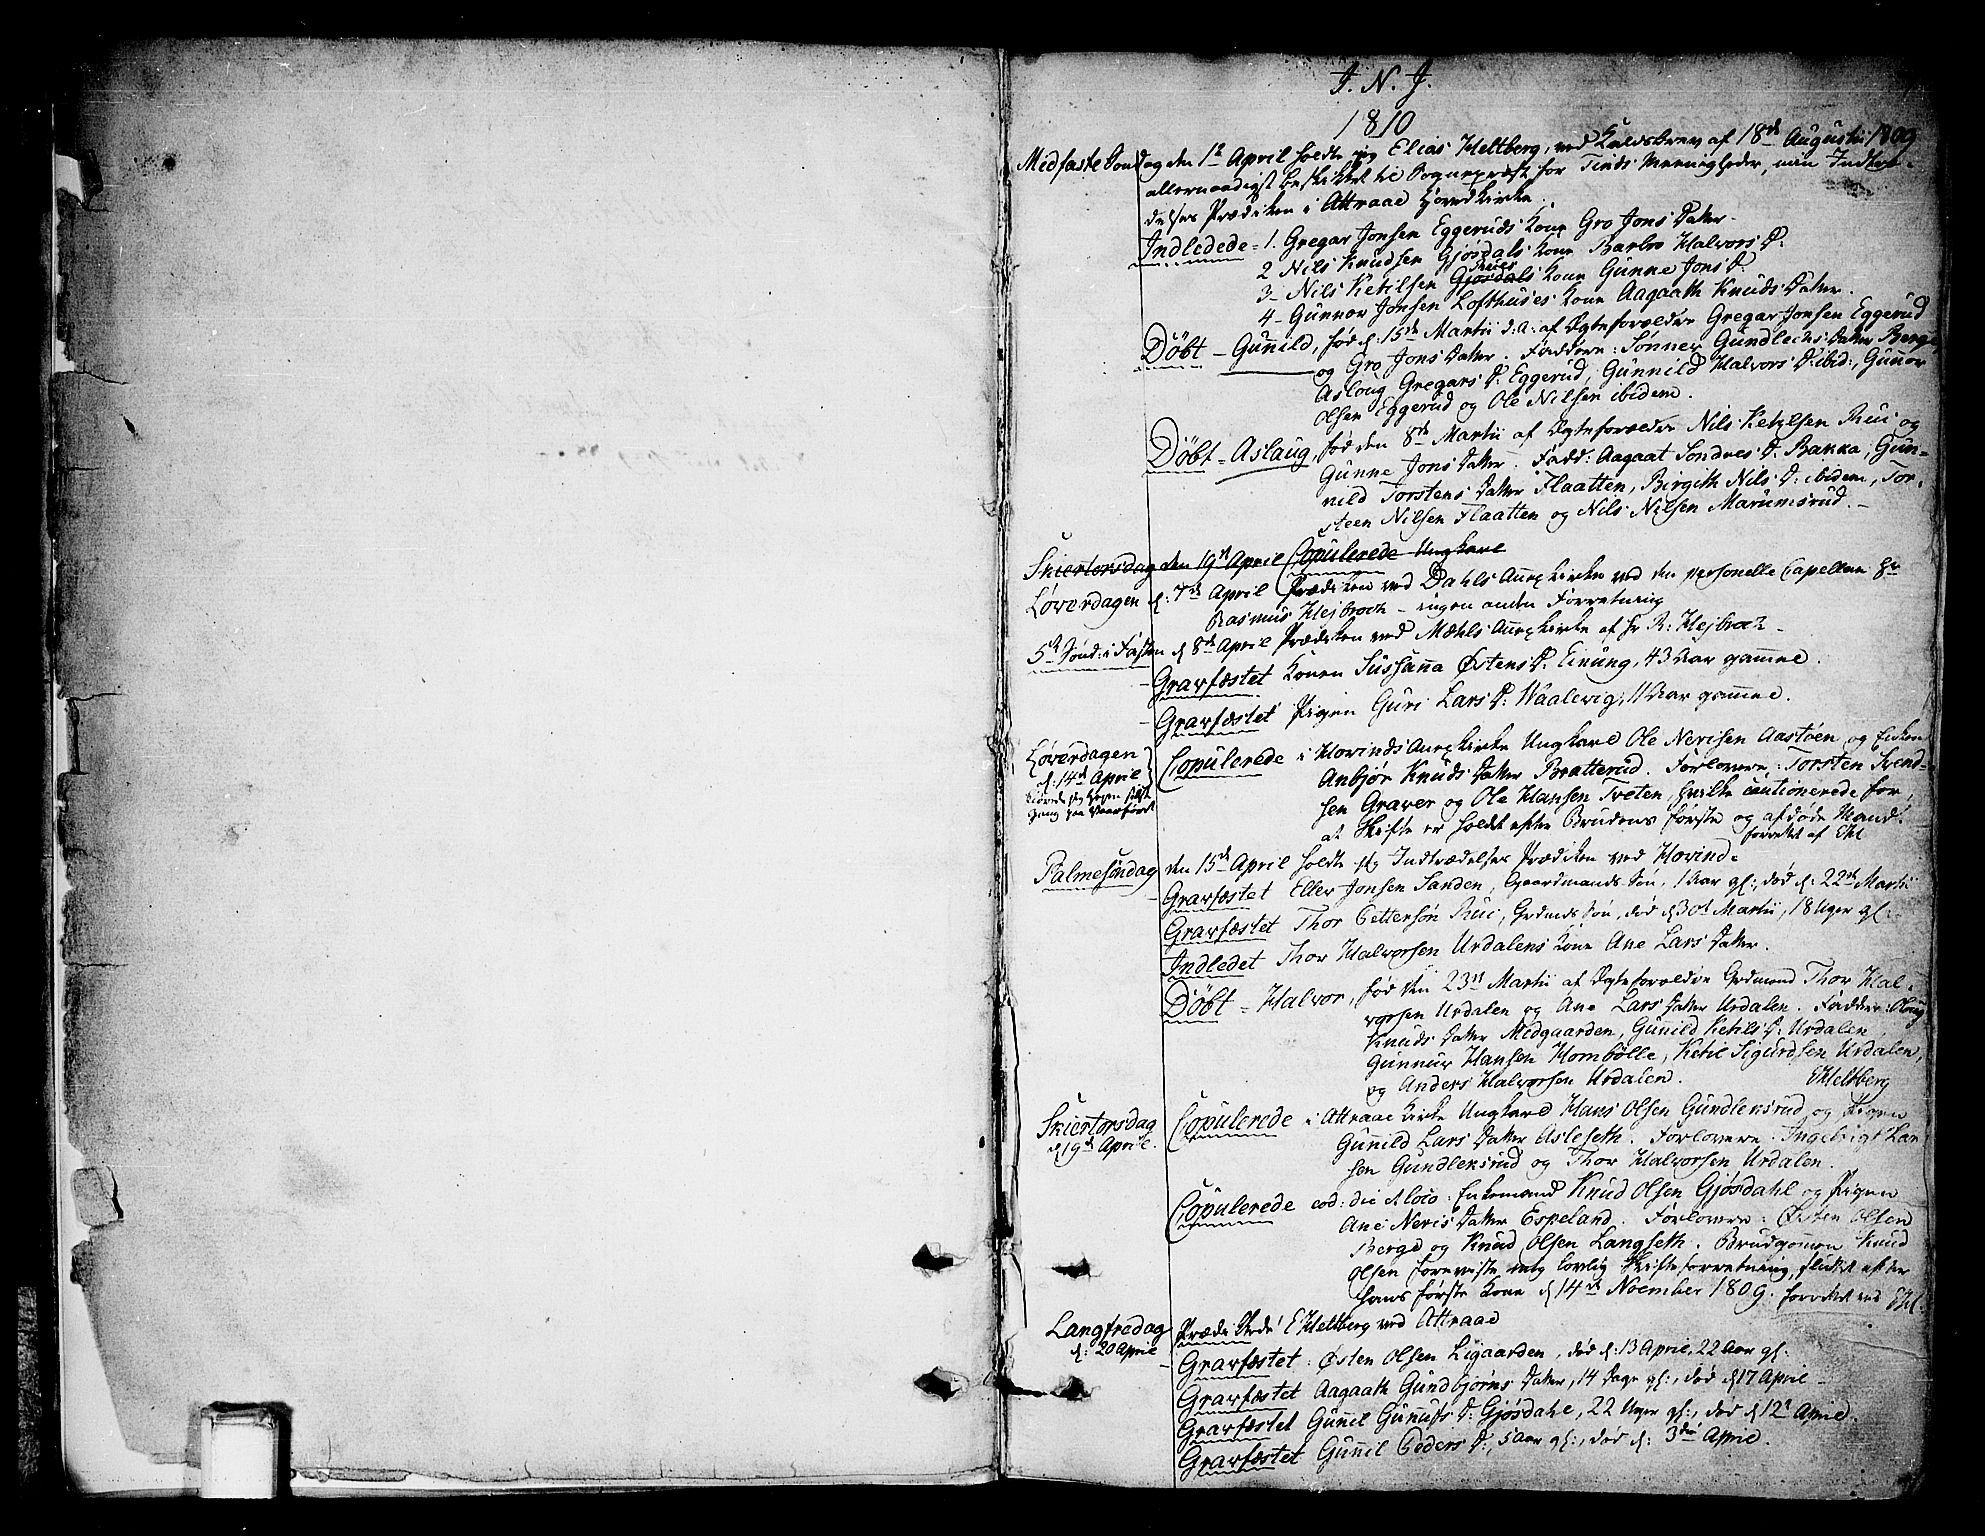 SAKO, Tinn kirkebøker, F/Fa/L0003: Ministerialbok nr. I 3, 1810-1814, s. 2-3